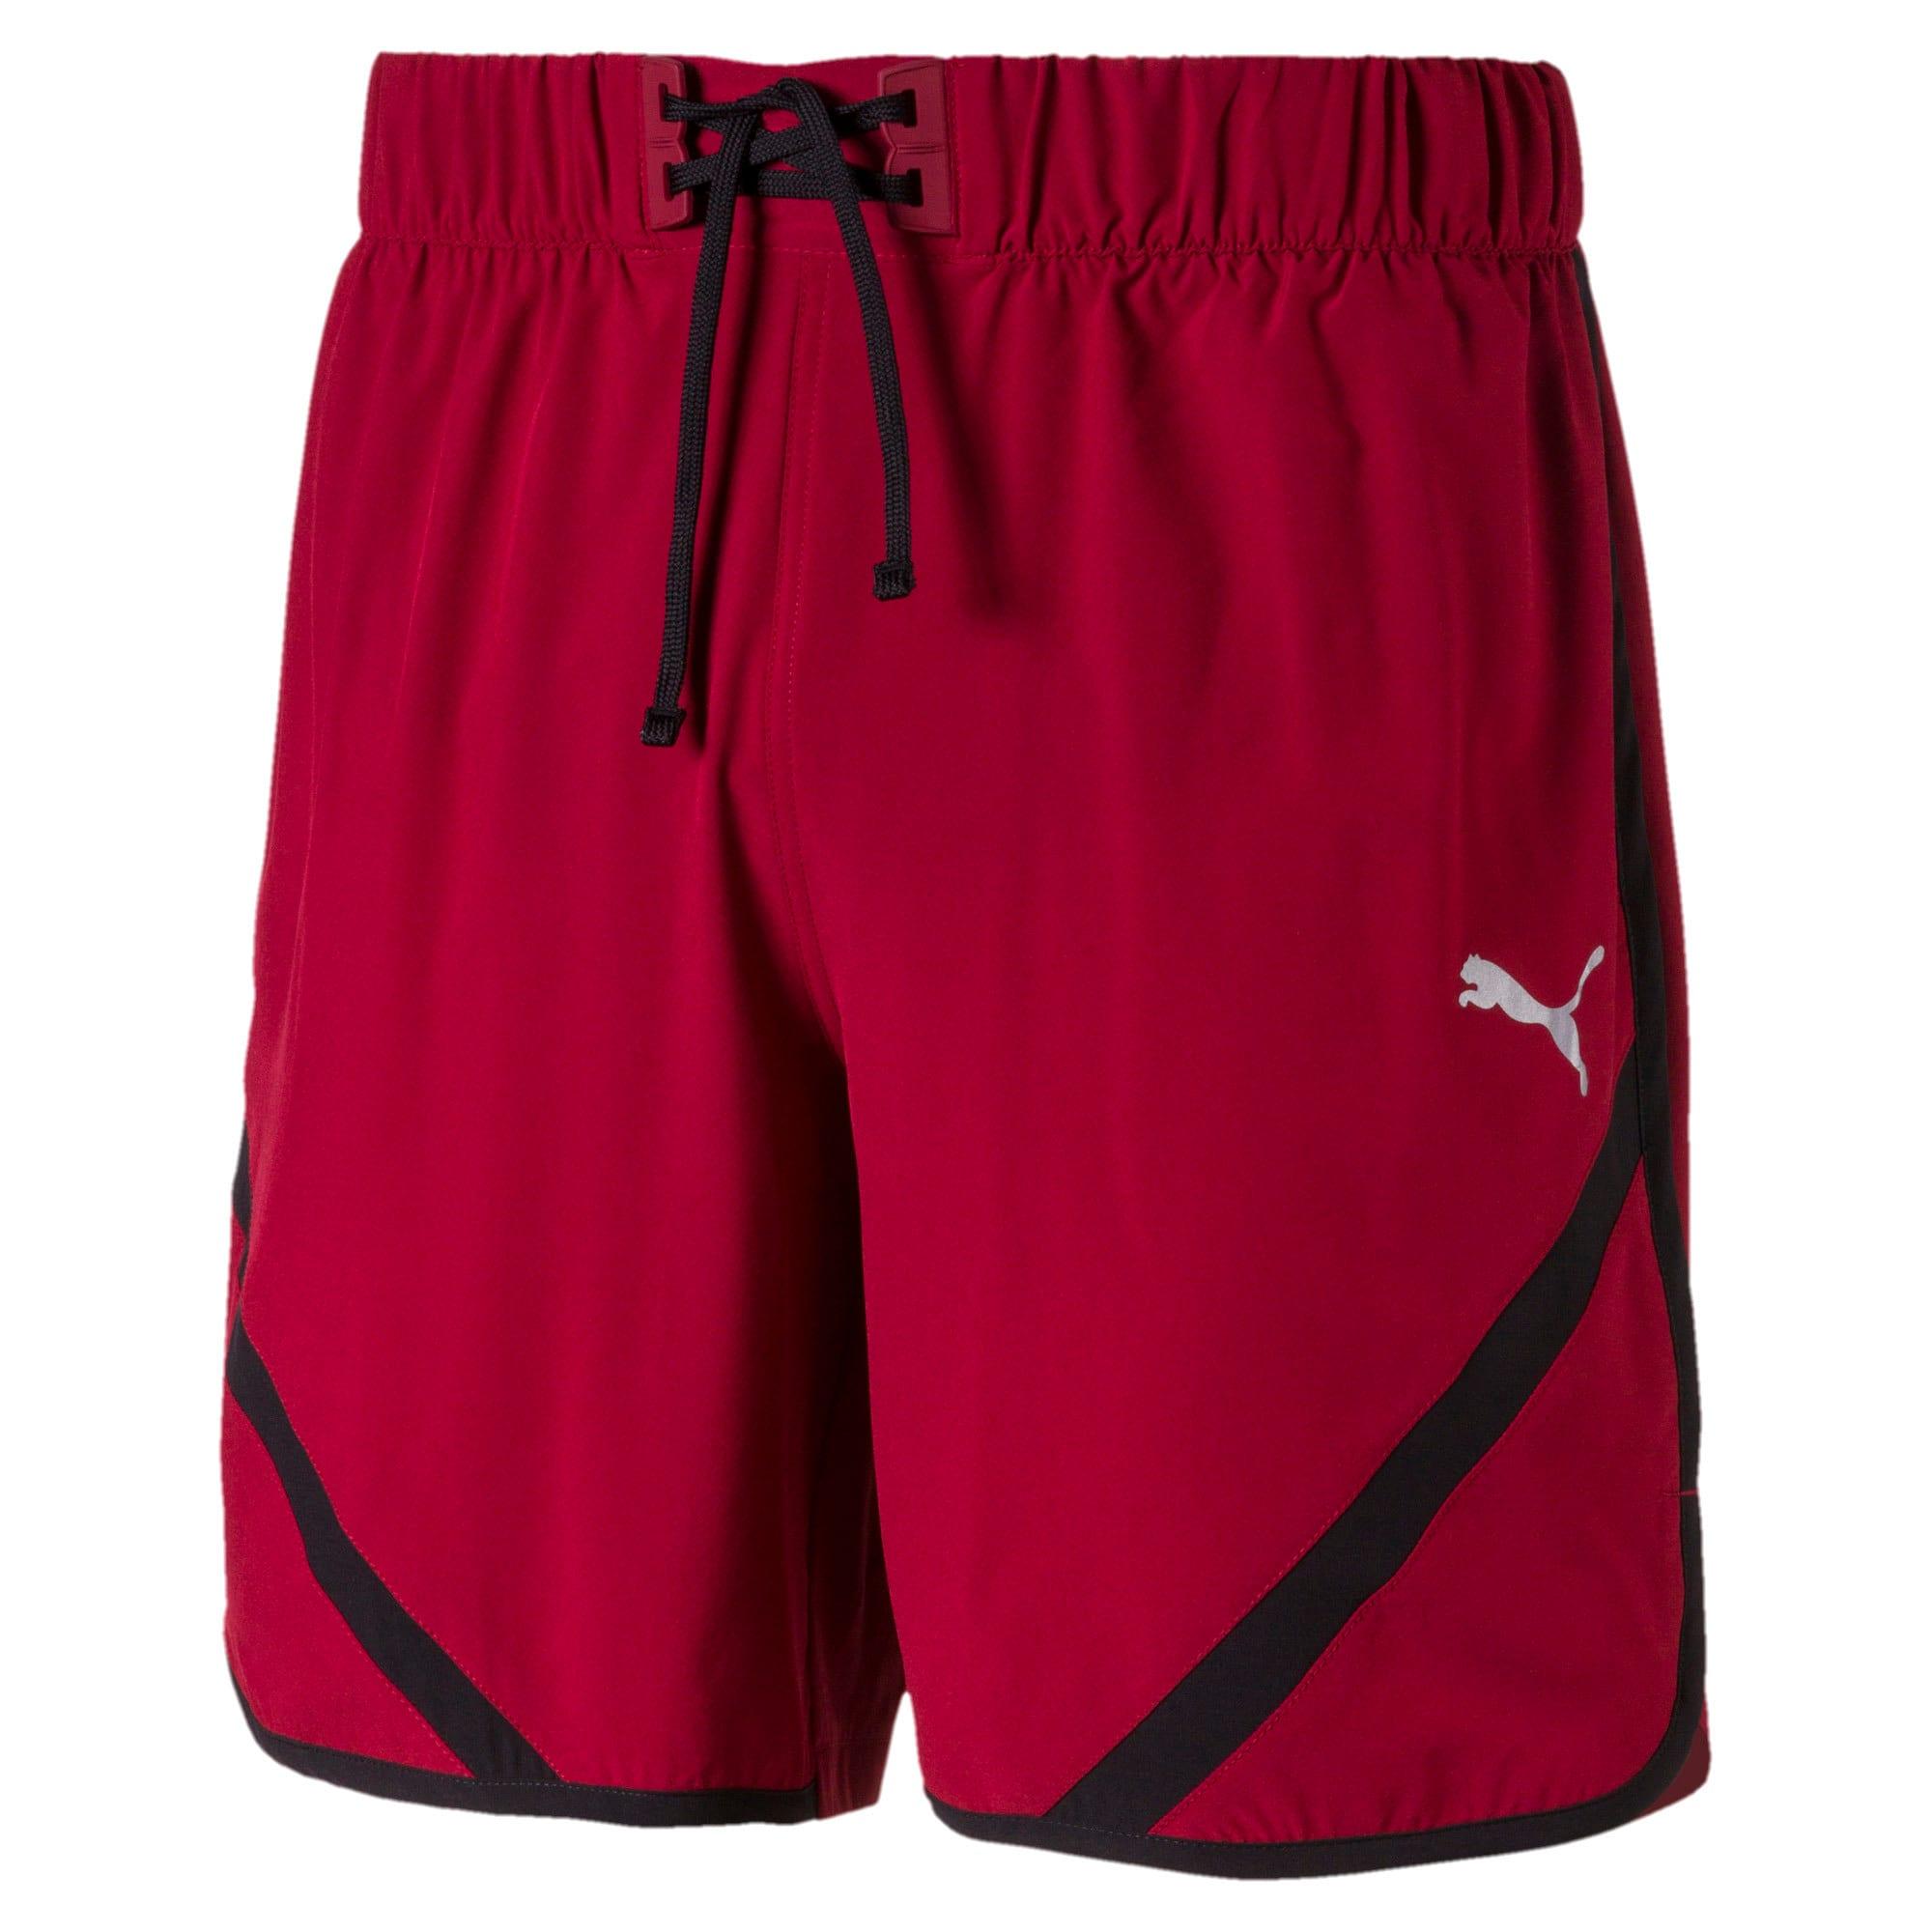 Thumbnail 4 of Get Fast Men's Shorts, Rhubarb-Puma Black, medium